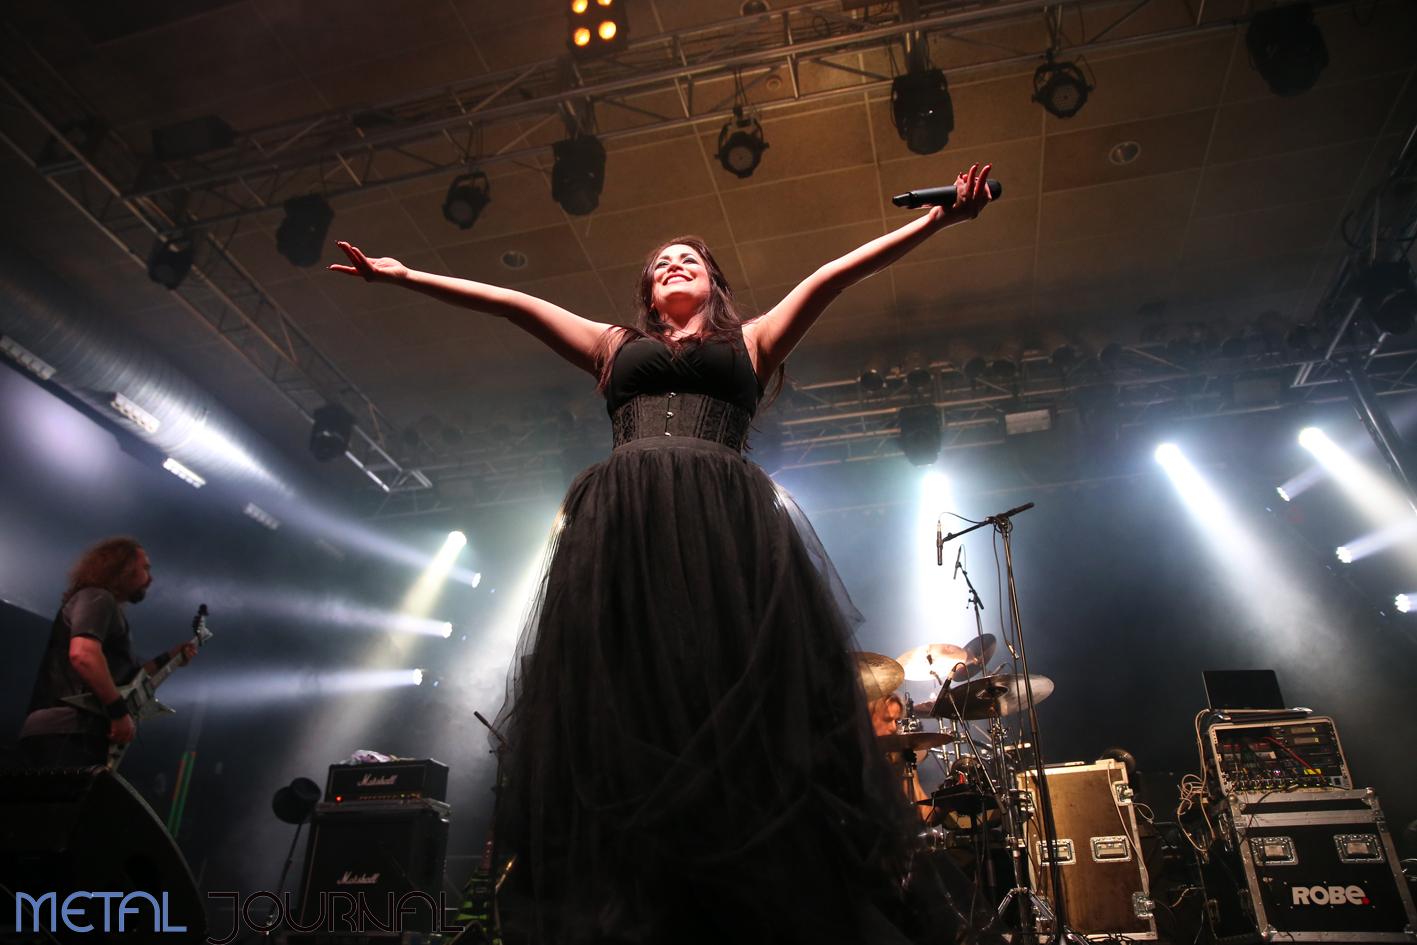 midnight eternal - metal journal bilbao 2018 pic 8